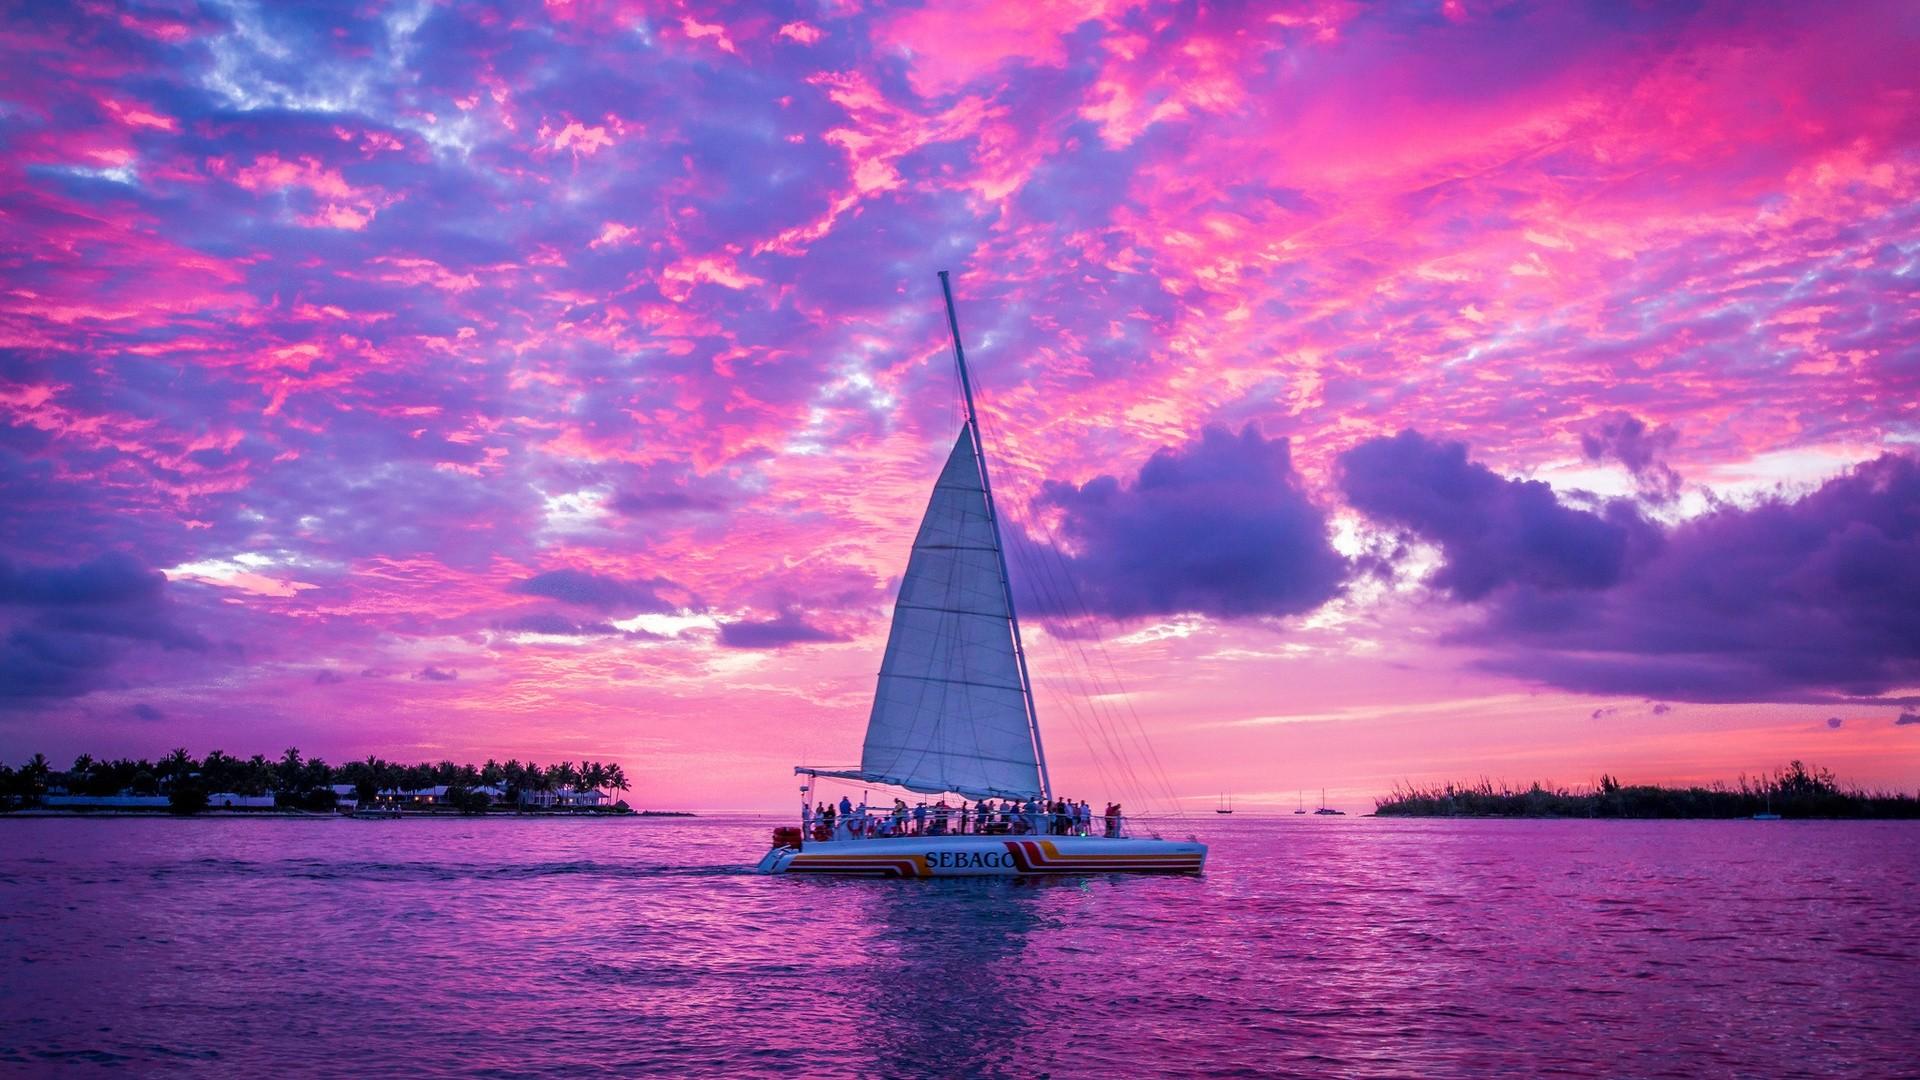 Pink Sunset High Quality